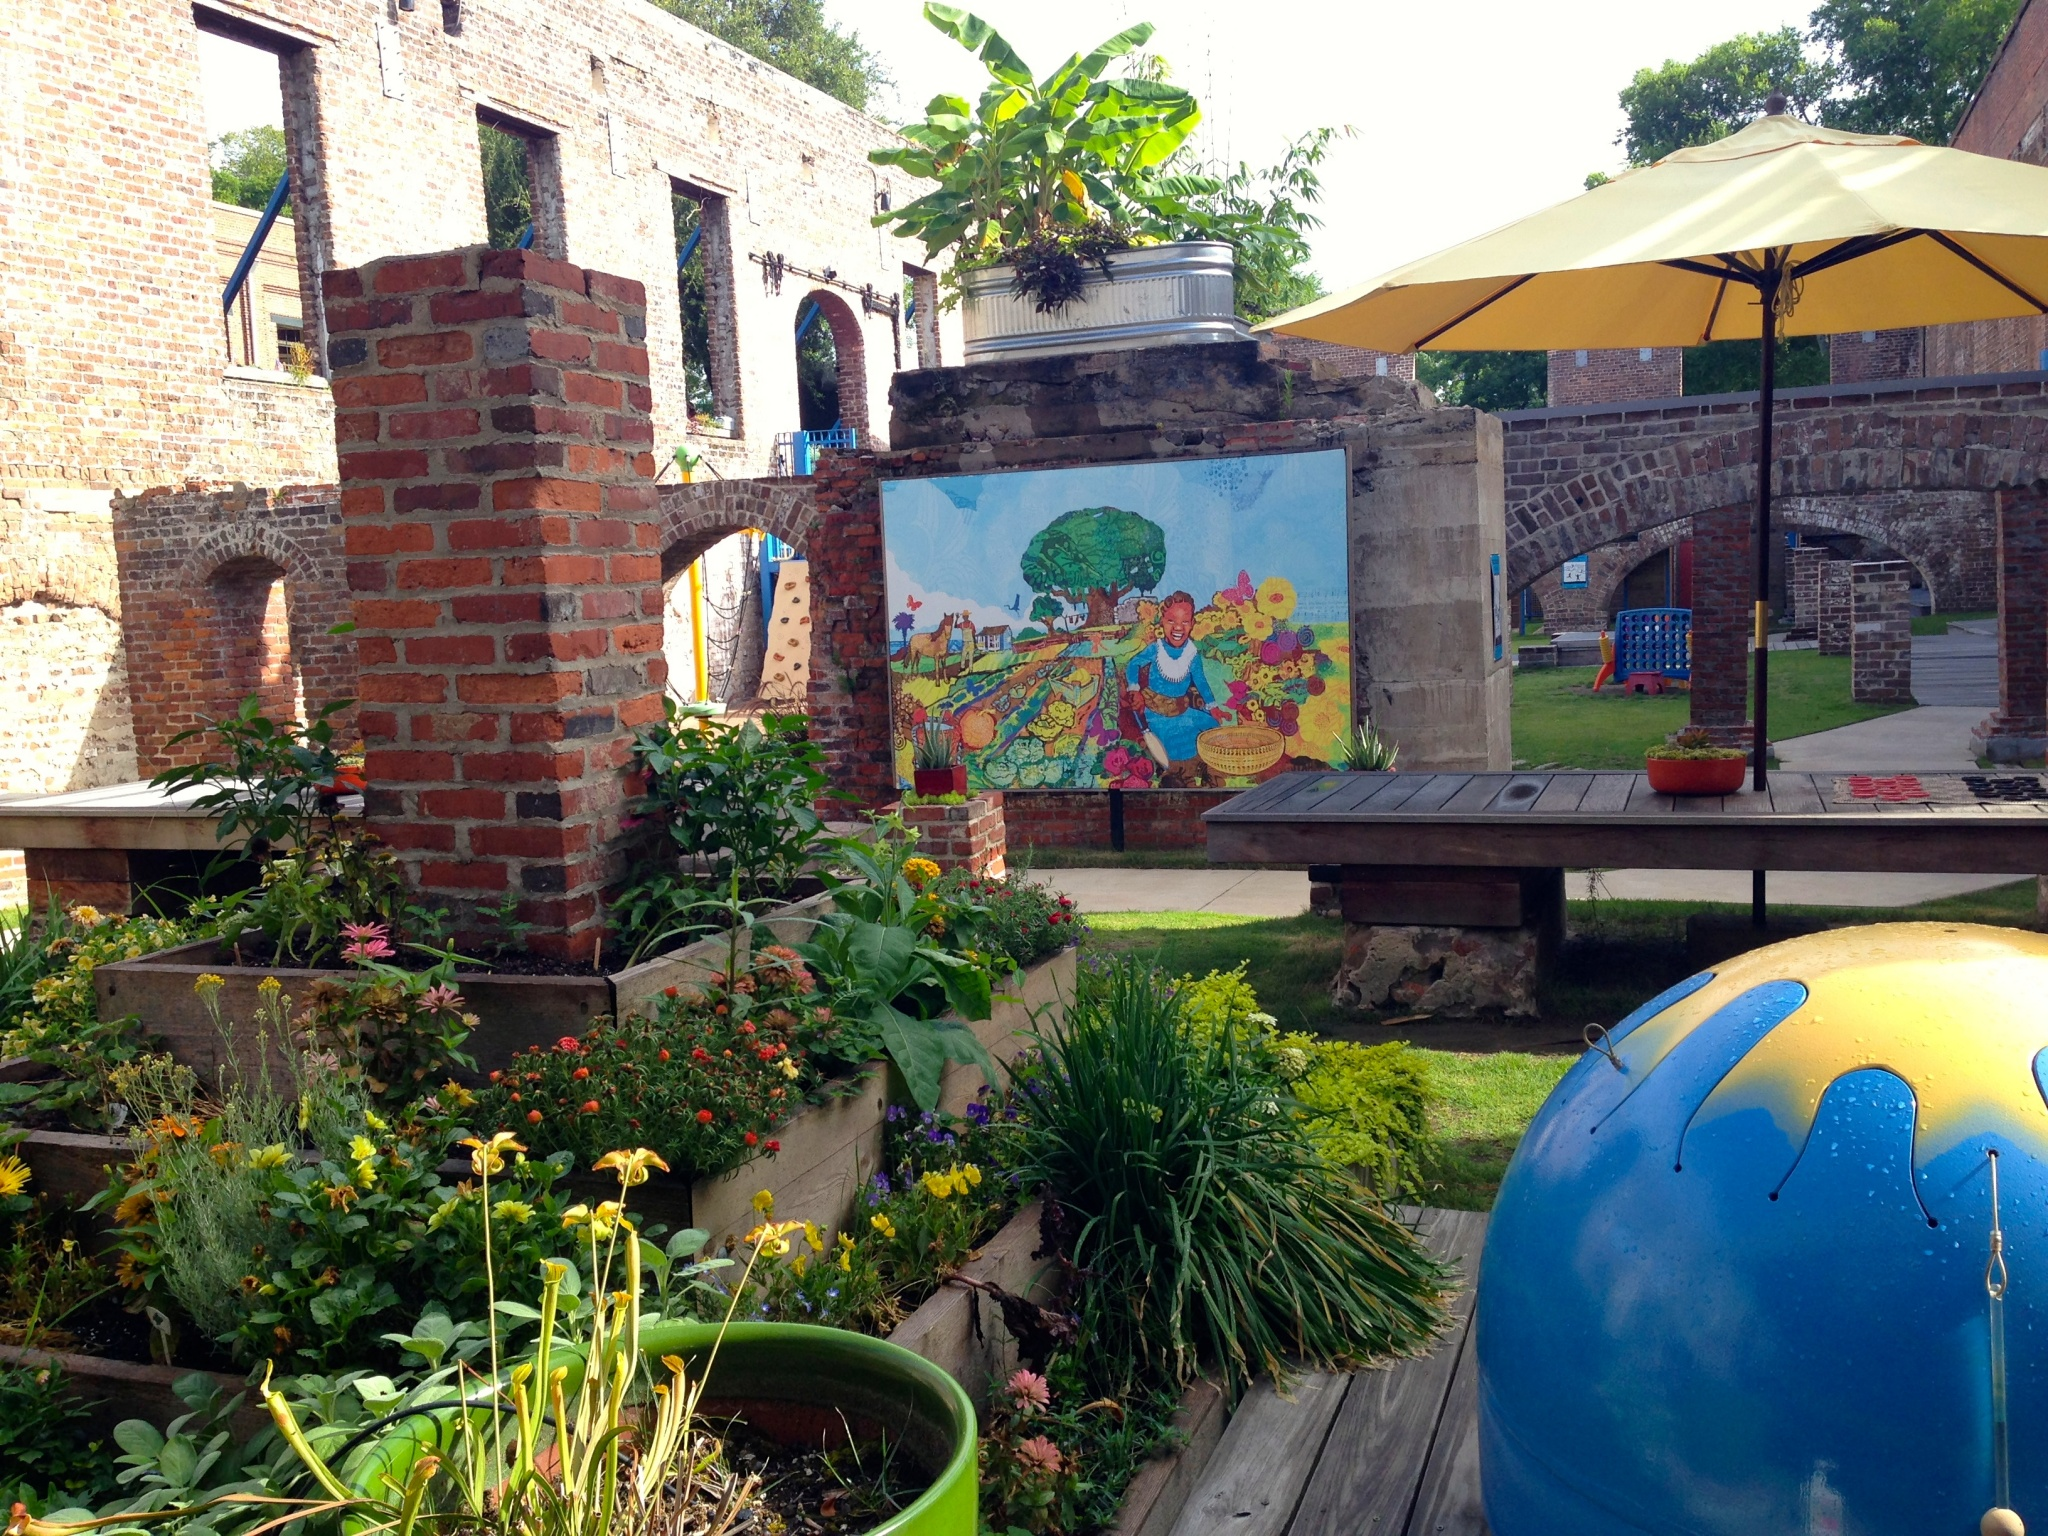 Savannah Children's Museum